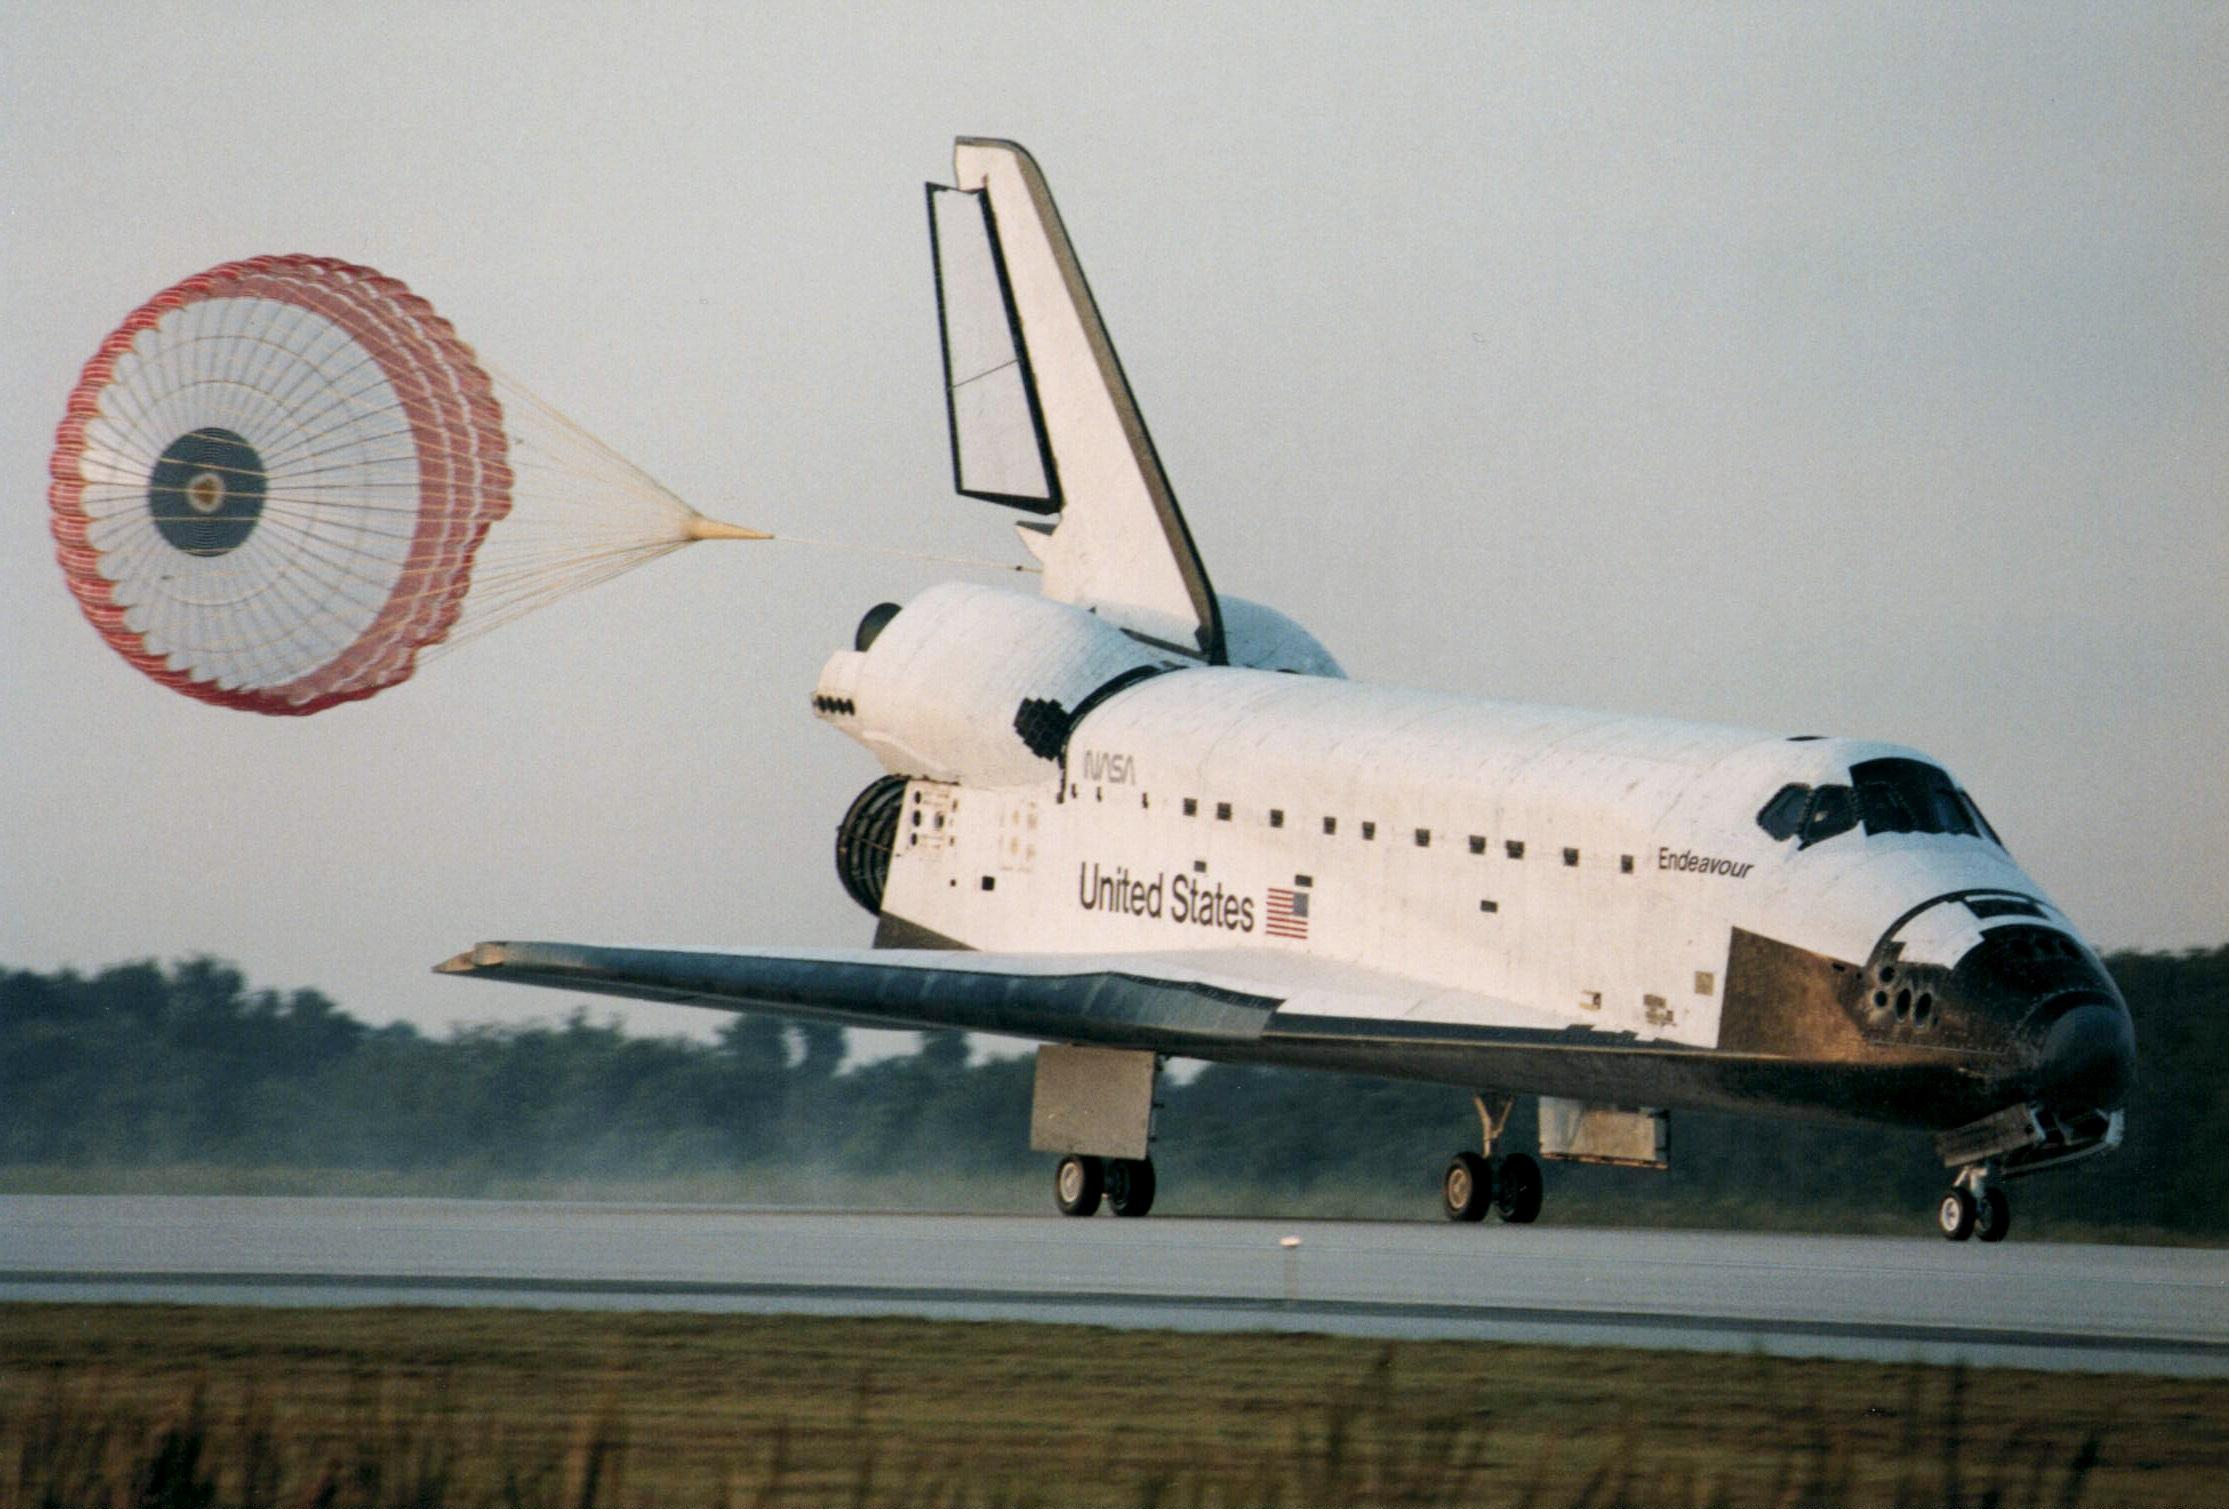 Endeavor space shuttle photo